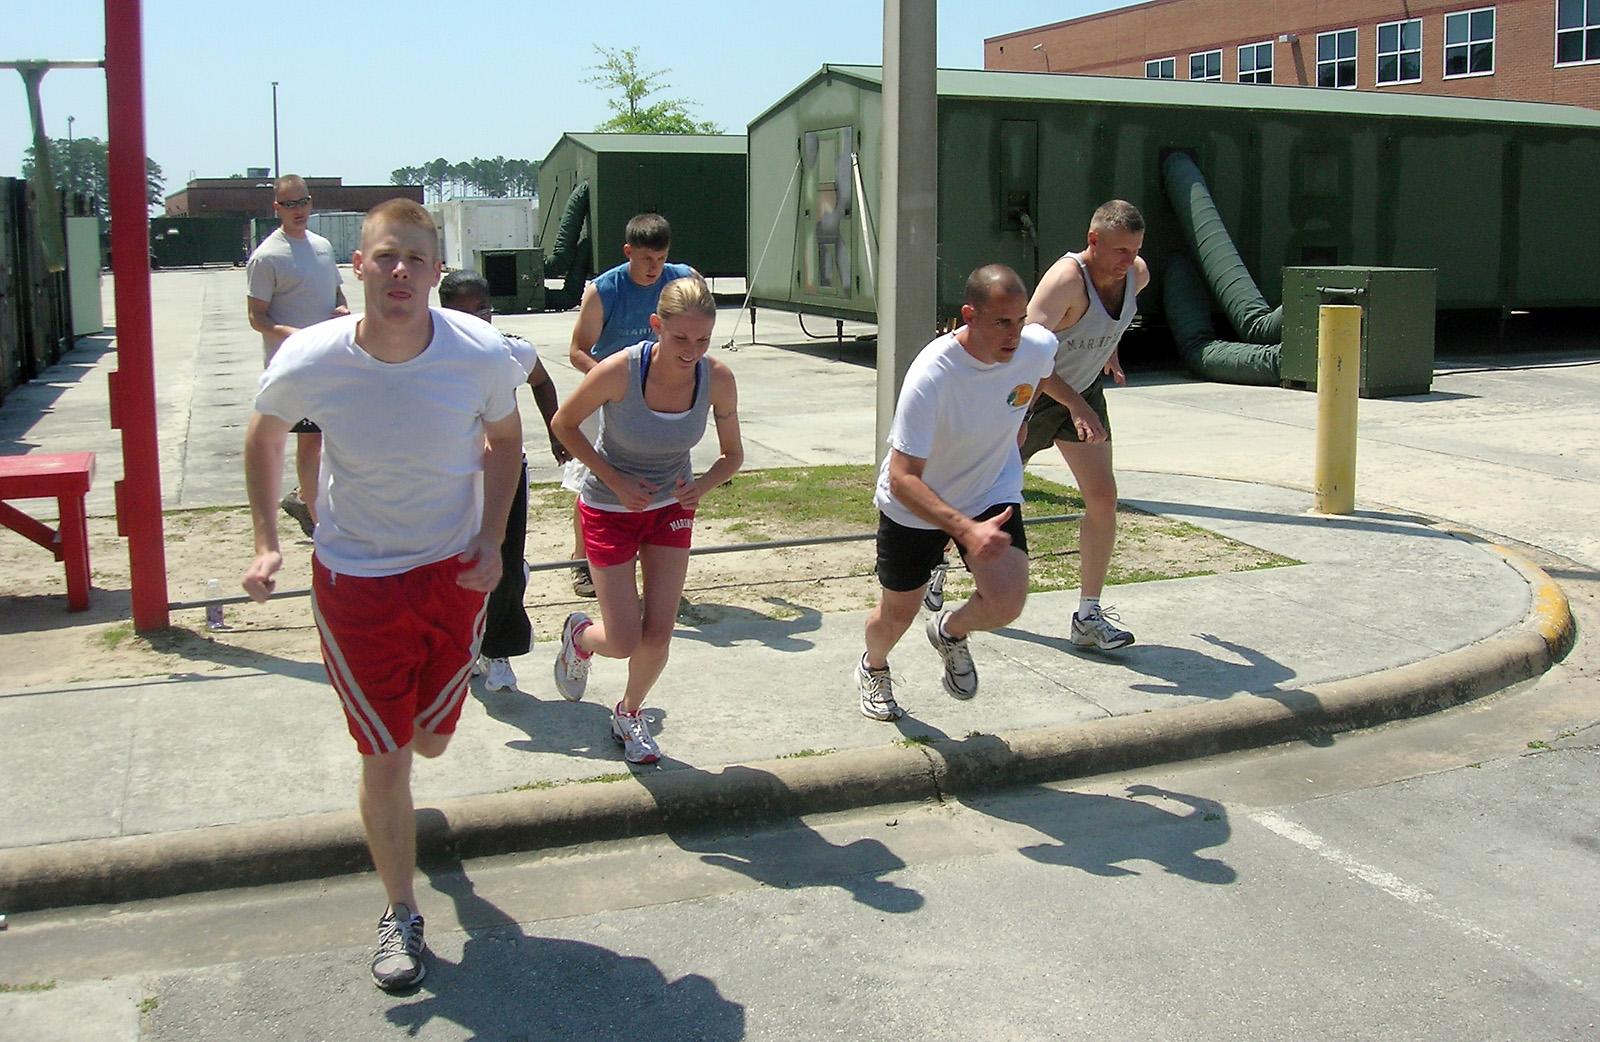 xxx Kasey warner in morning workout